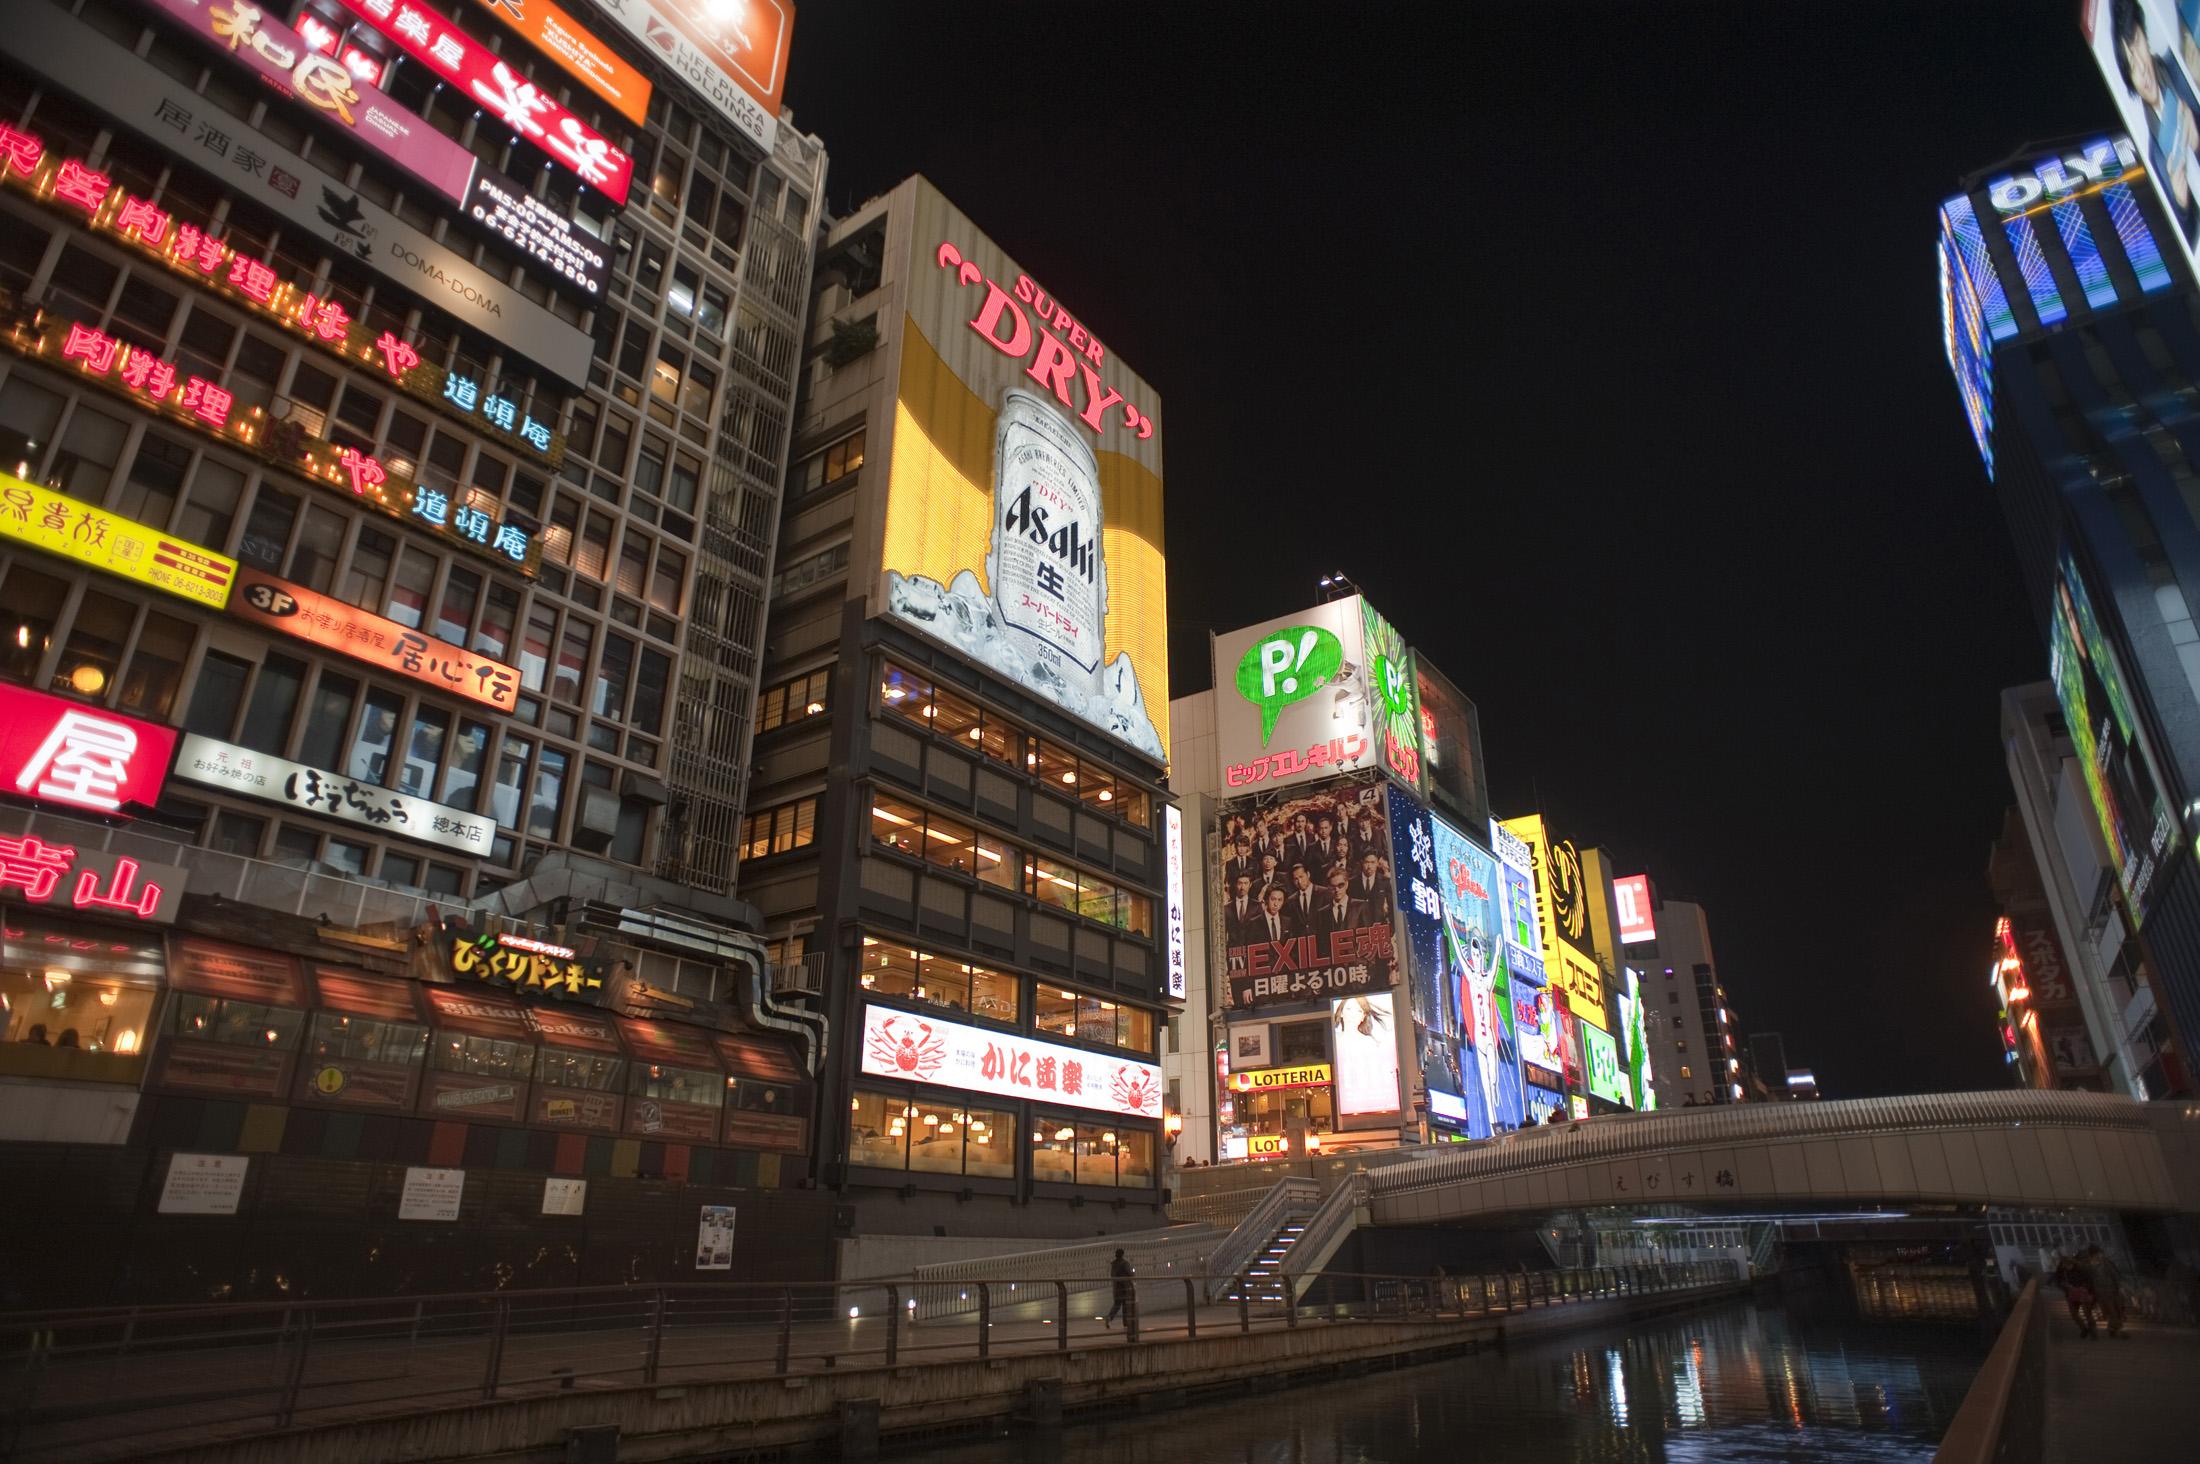 Free Stock photo of Dotonbori at Night   Photoeverywhere